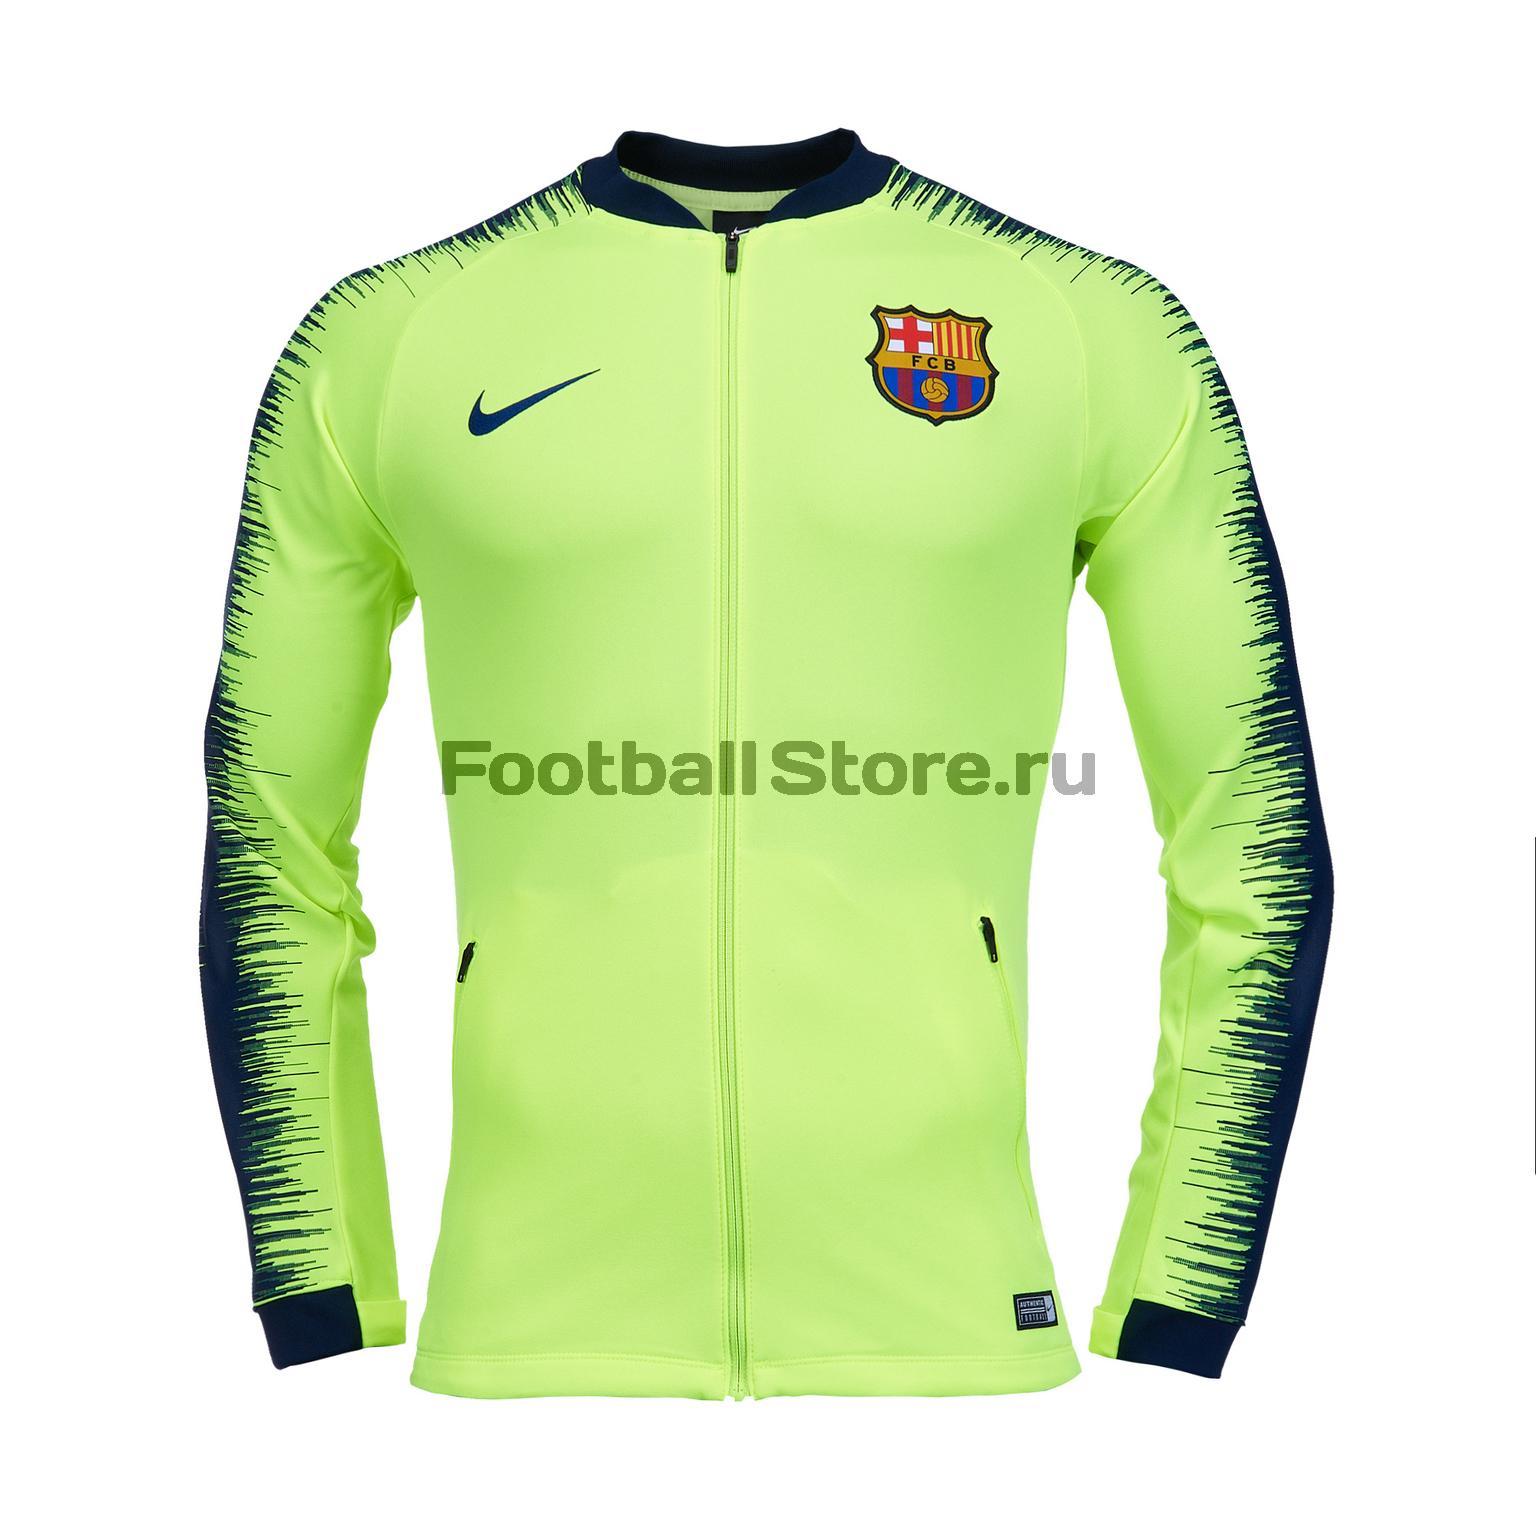 56e0dc6430b Олимпийка Nike FC Barcelona JKT 894361-705 – купить в интернет ...